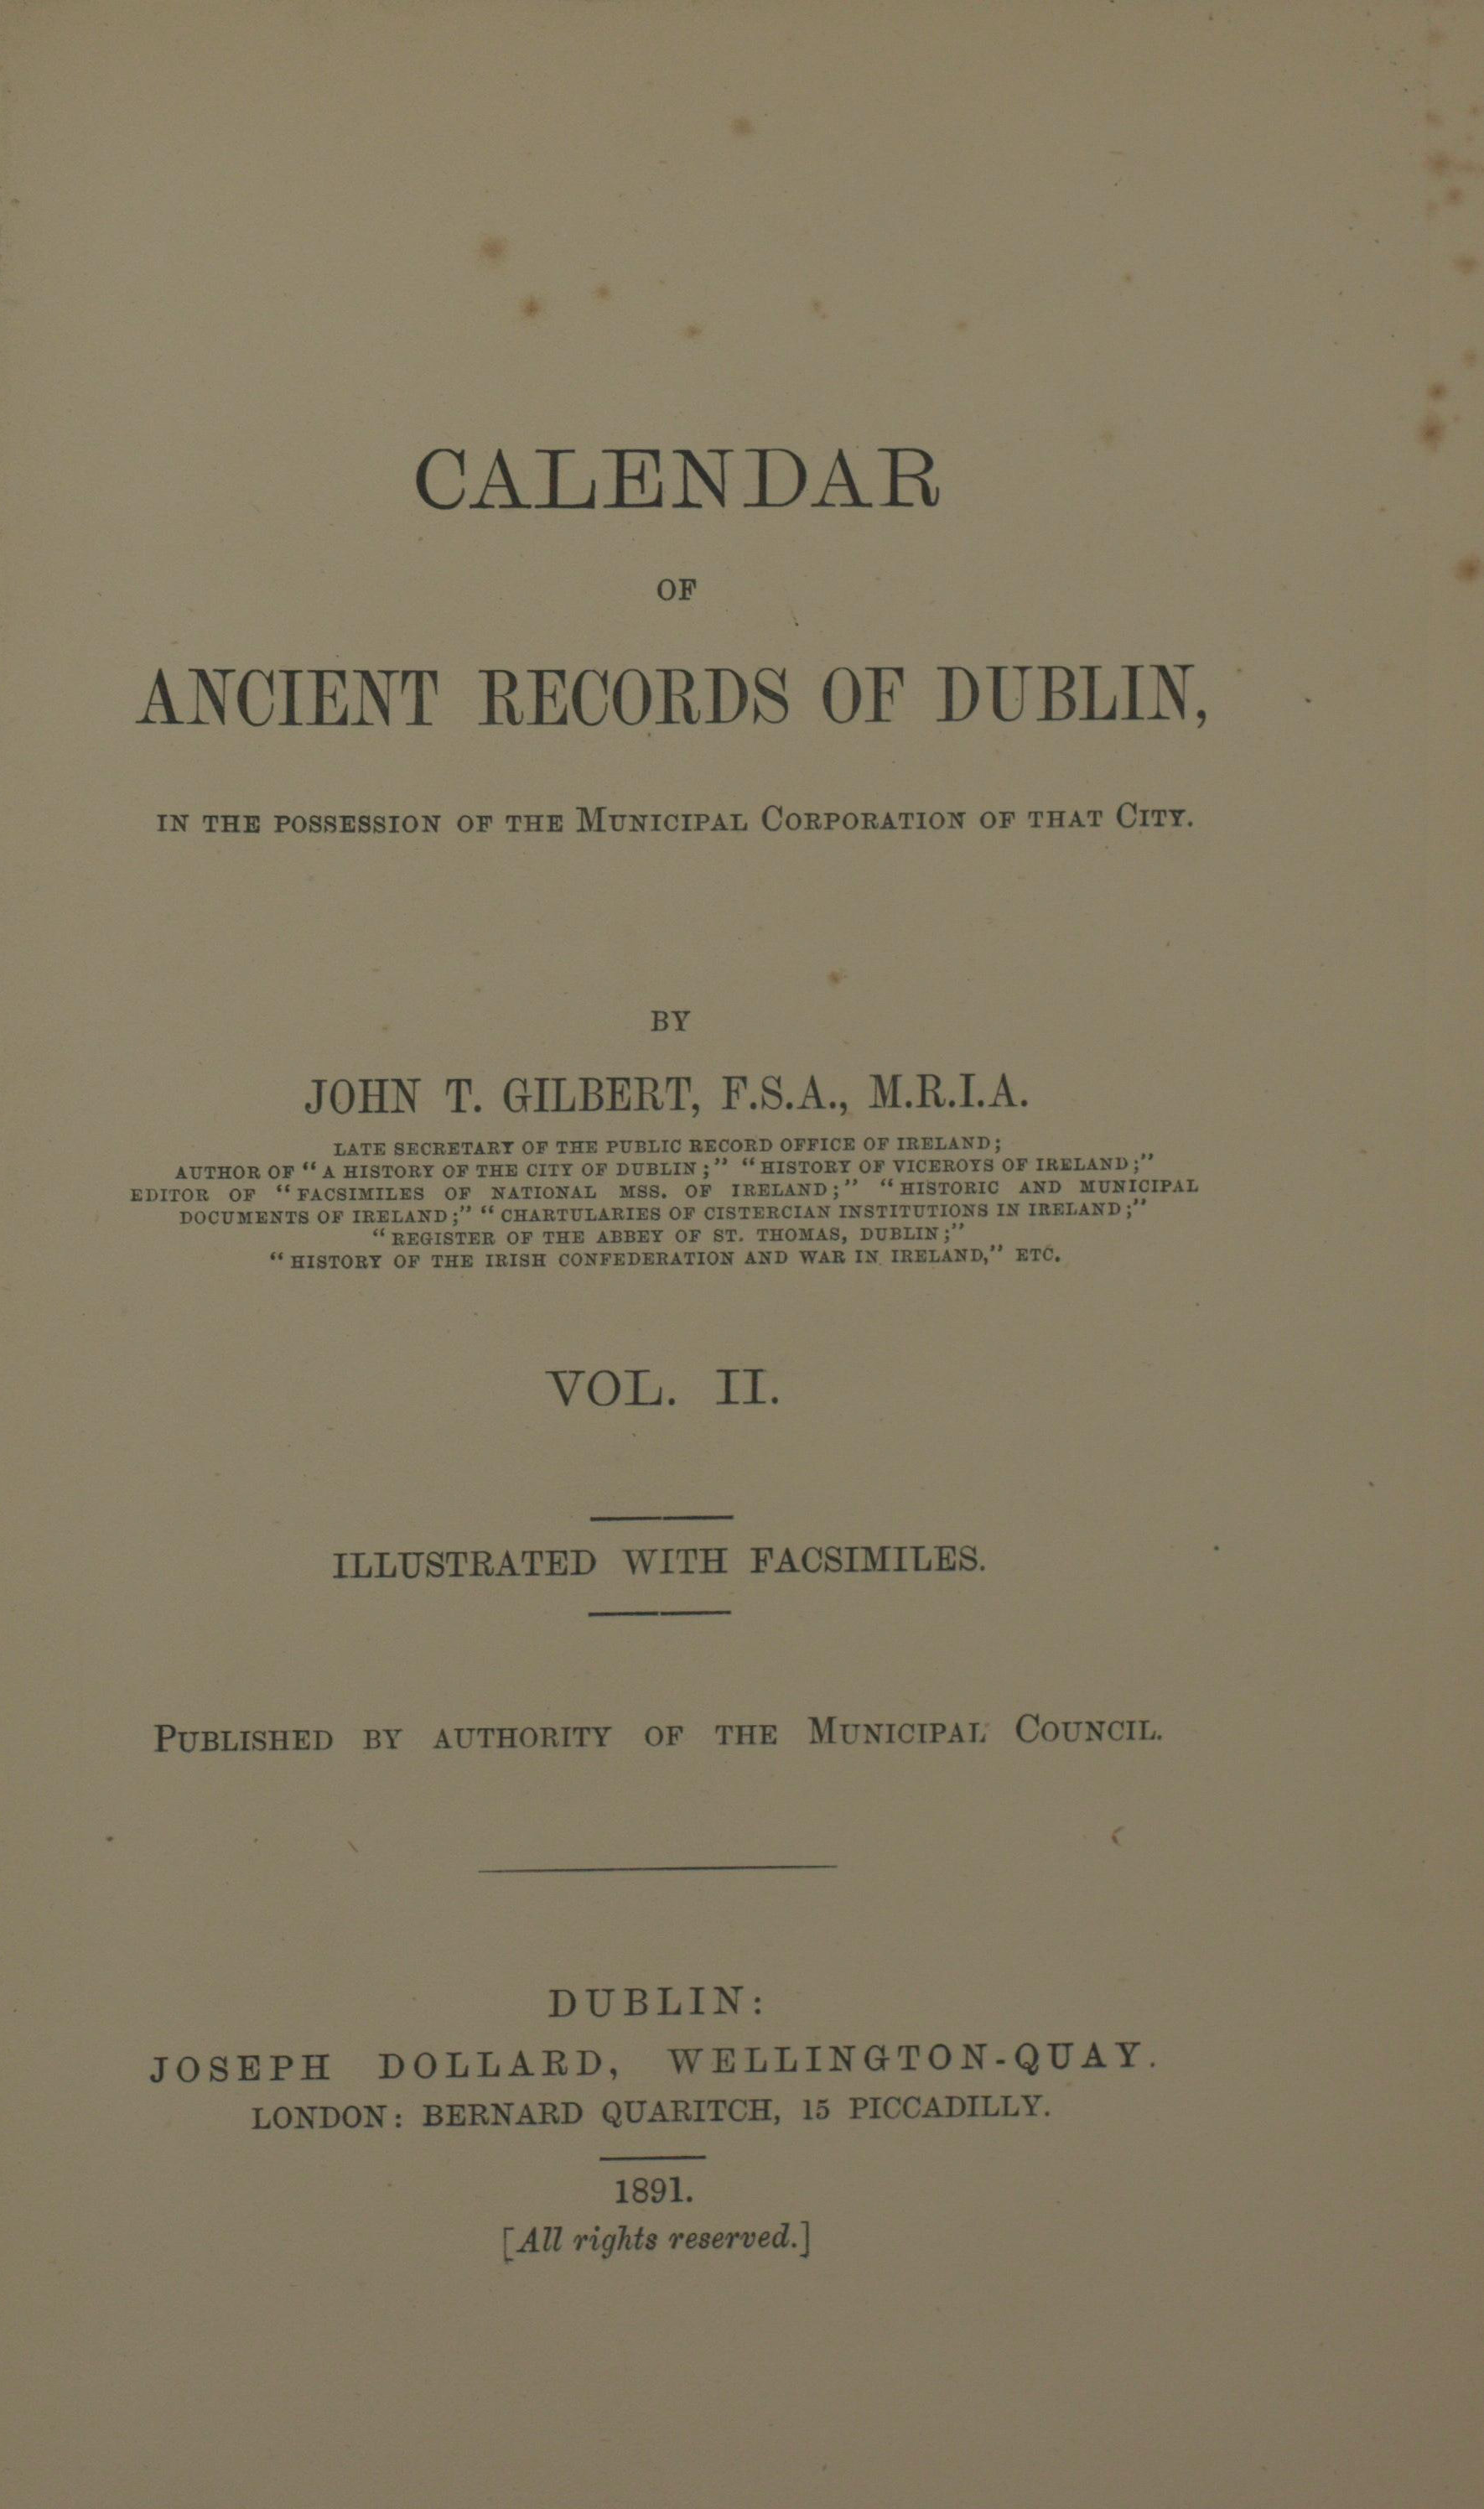 photo of Calendar of Ancient Records of Dublin Vol II, 1891